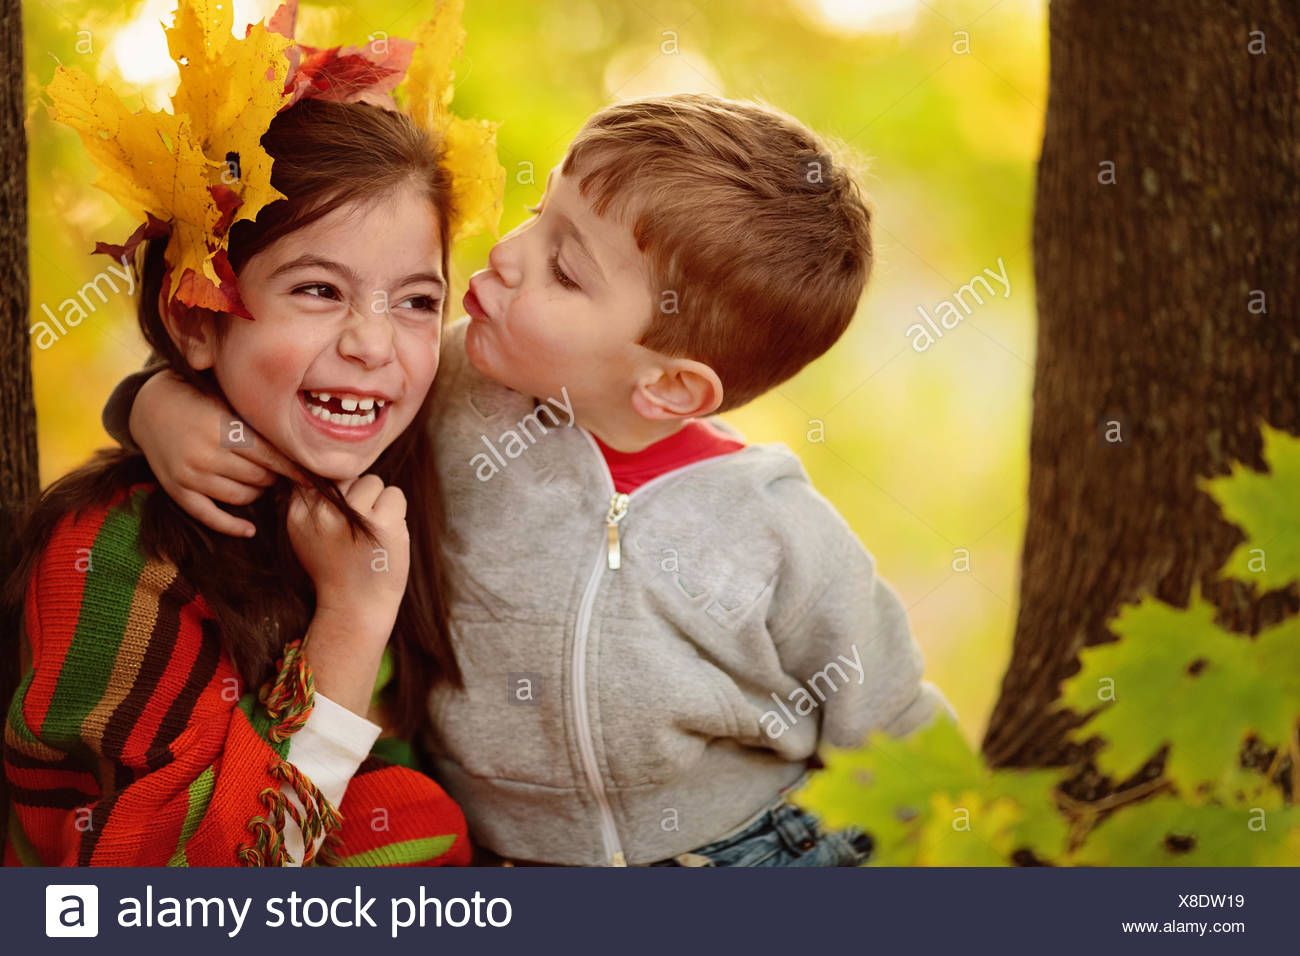 Girl Kissing Boy Stock Photos  Girl Kissing Boy Stock -7918